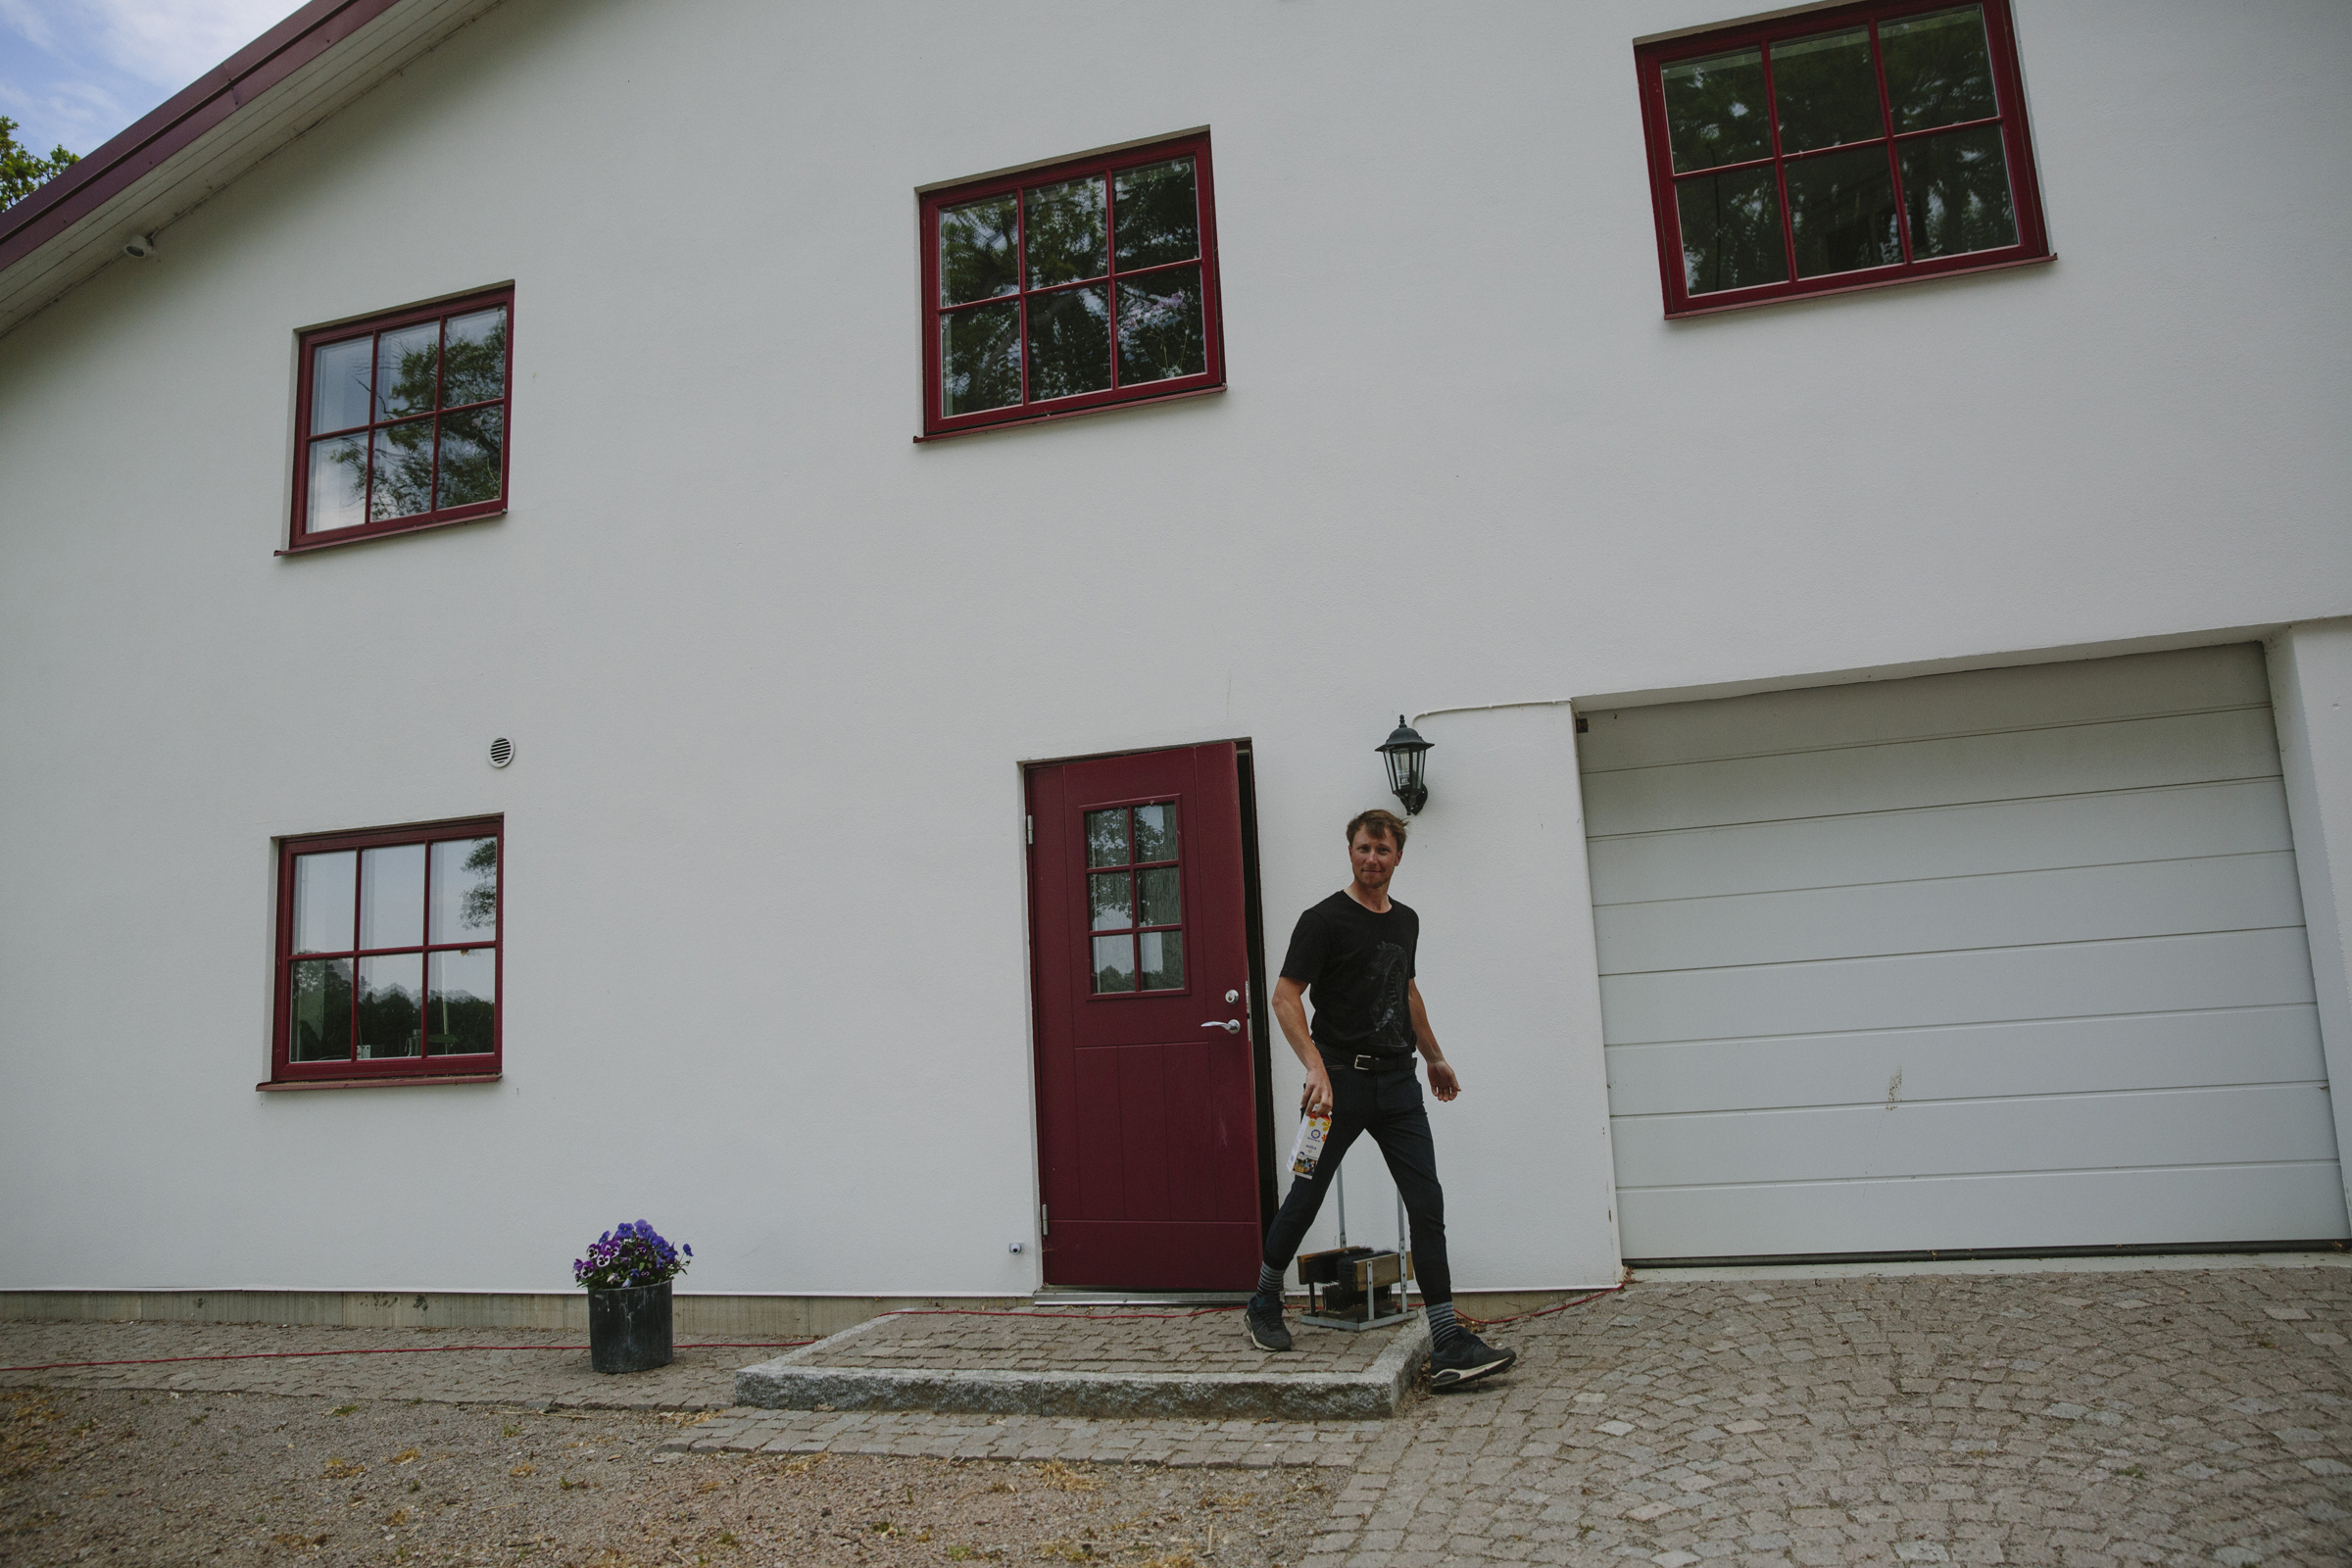 2018-05-17 Douglas LindelöwFoto: Lotta Brundin Gyllensten/lottapictures